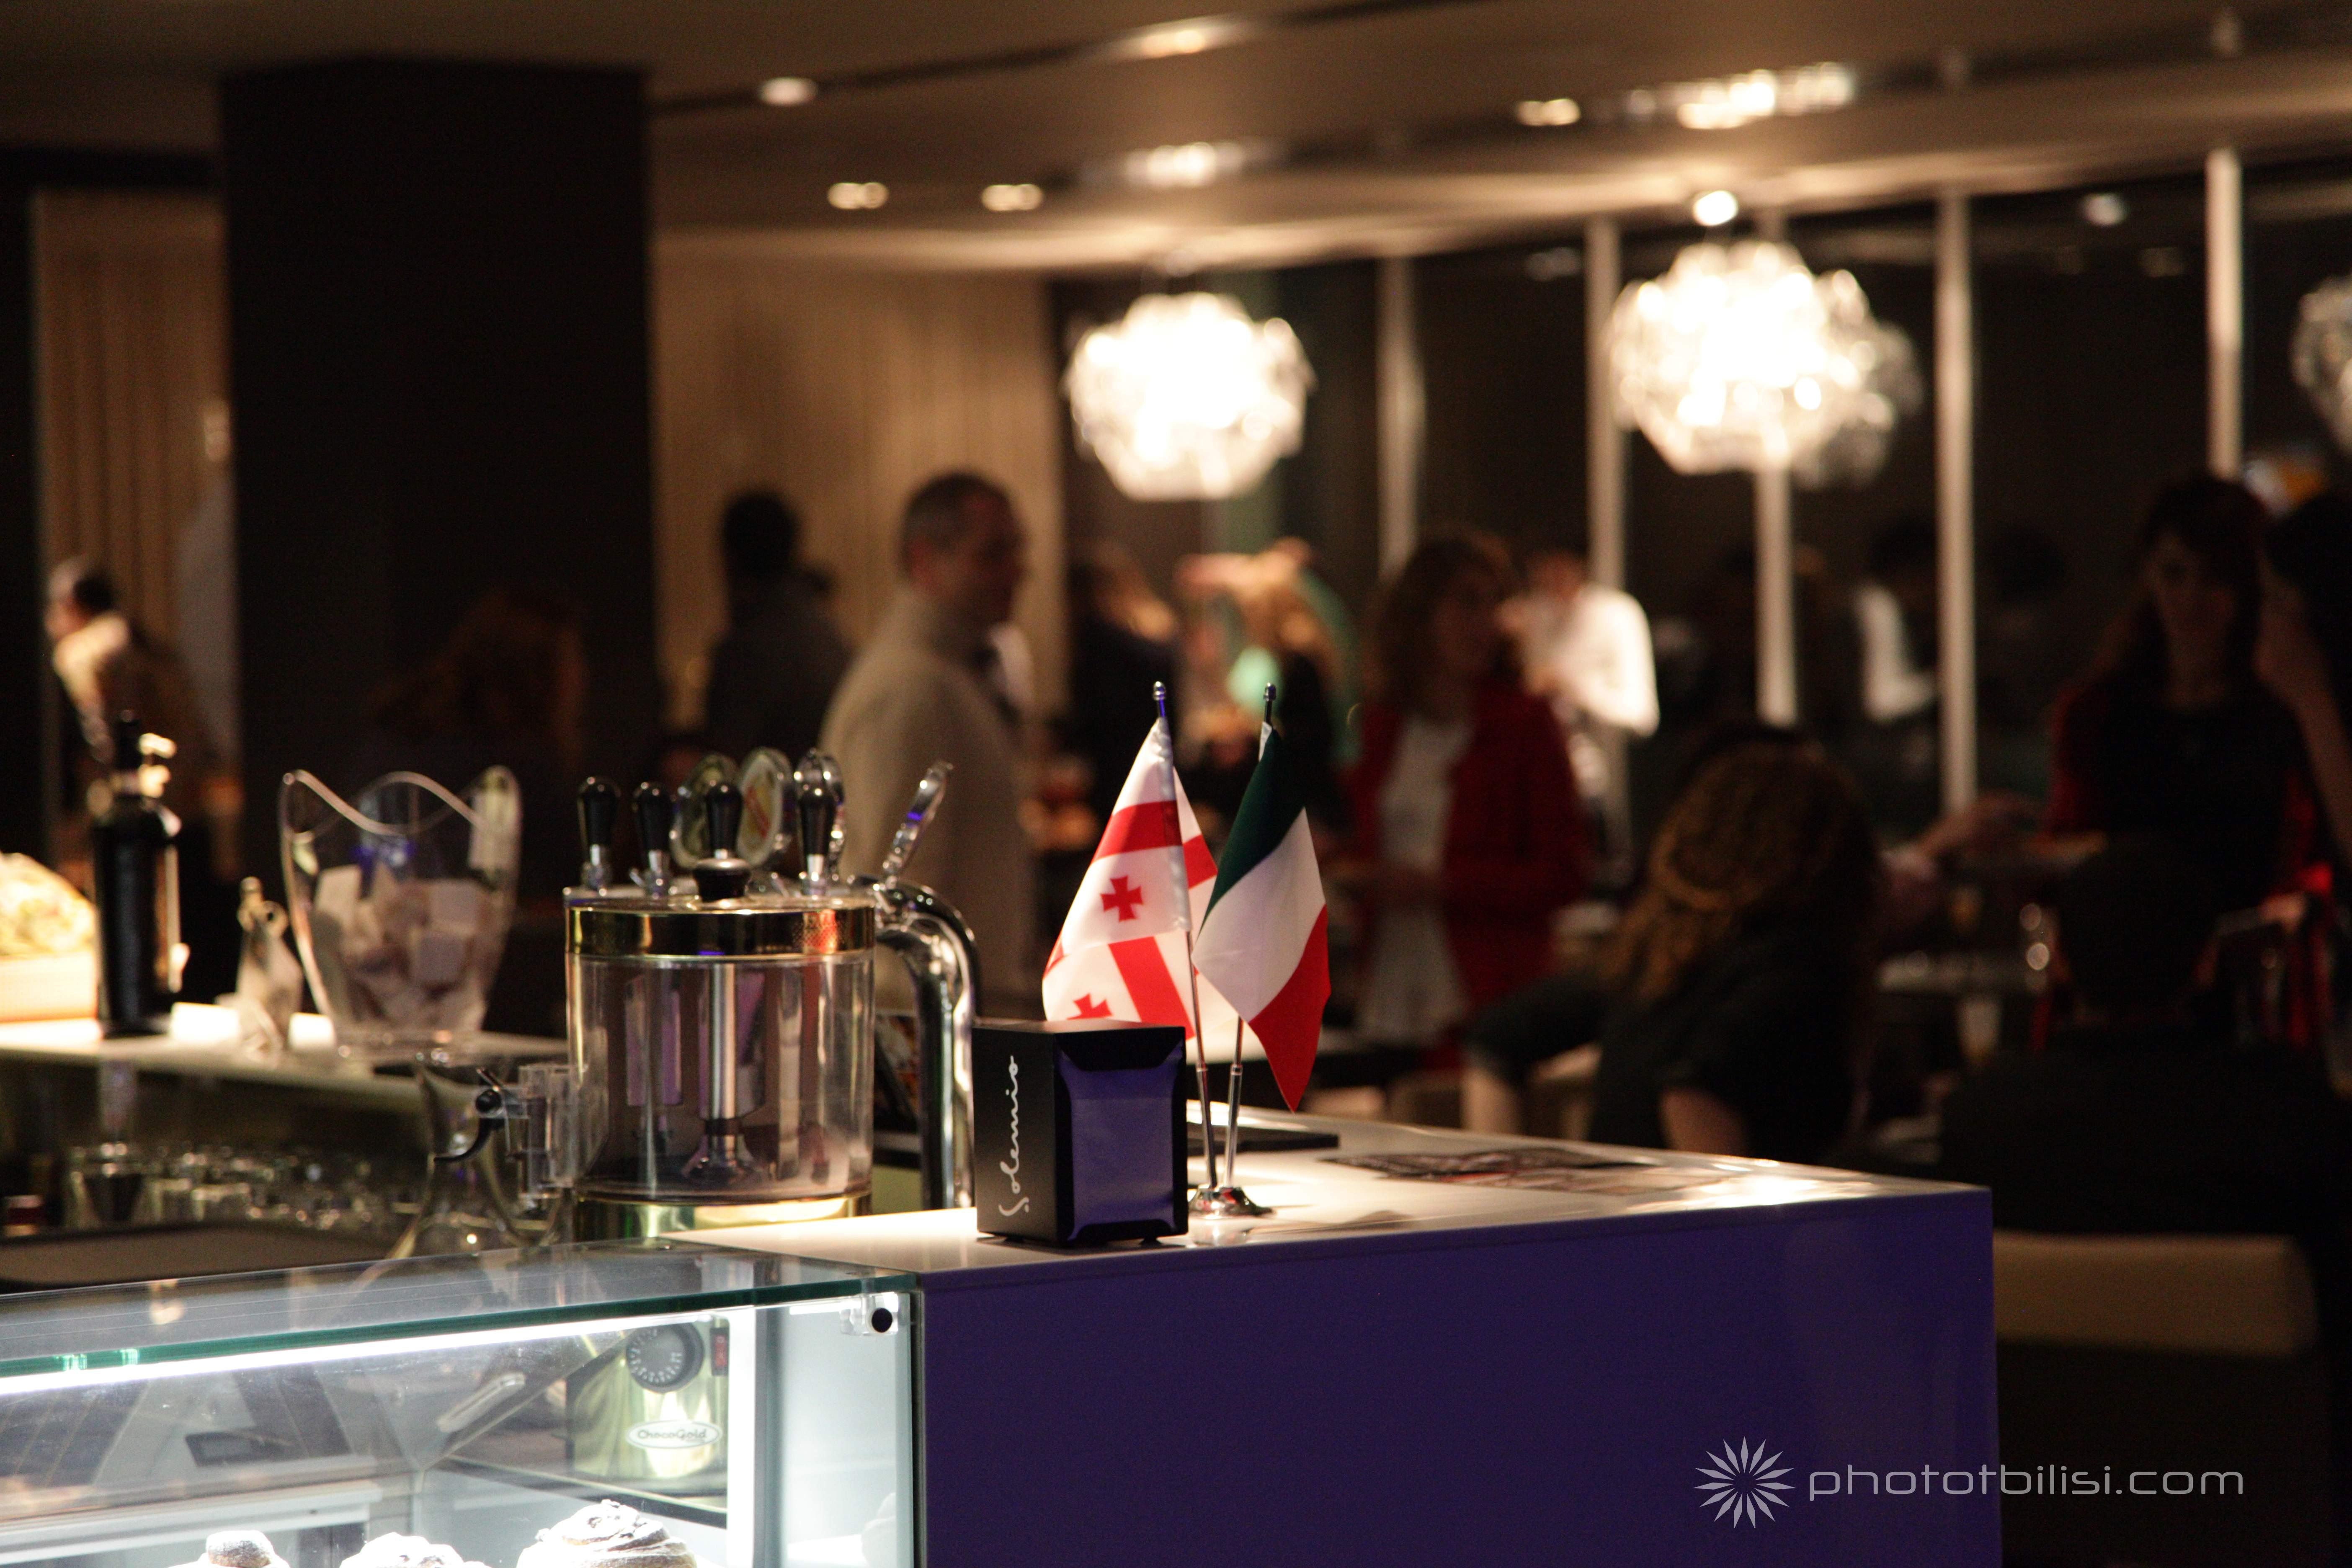 interiors - restaurant IMG_7850